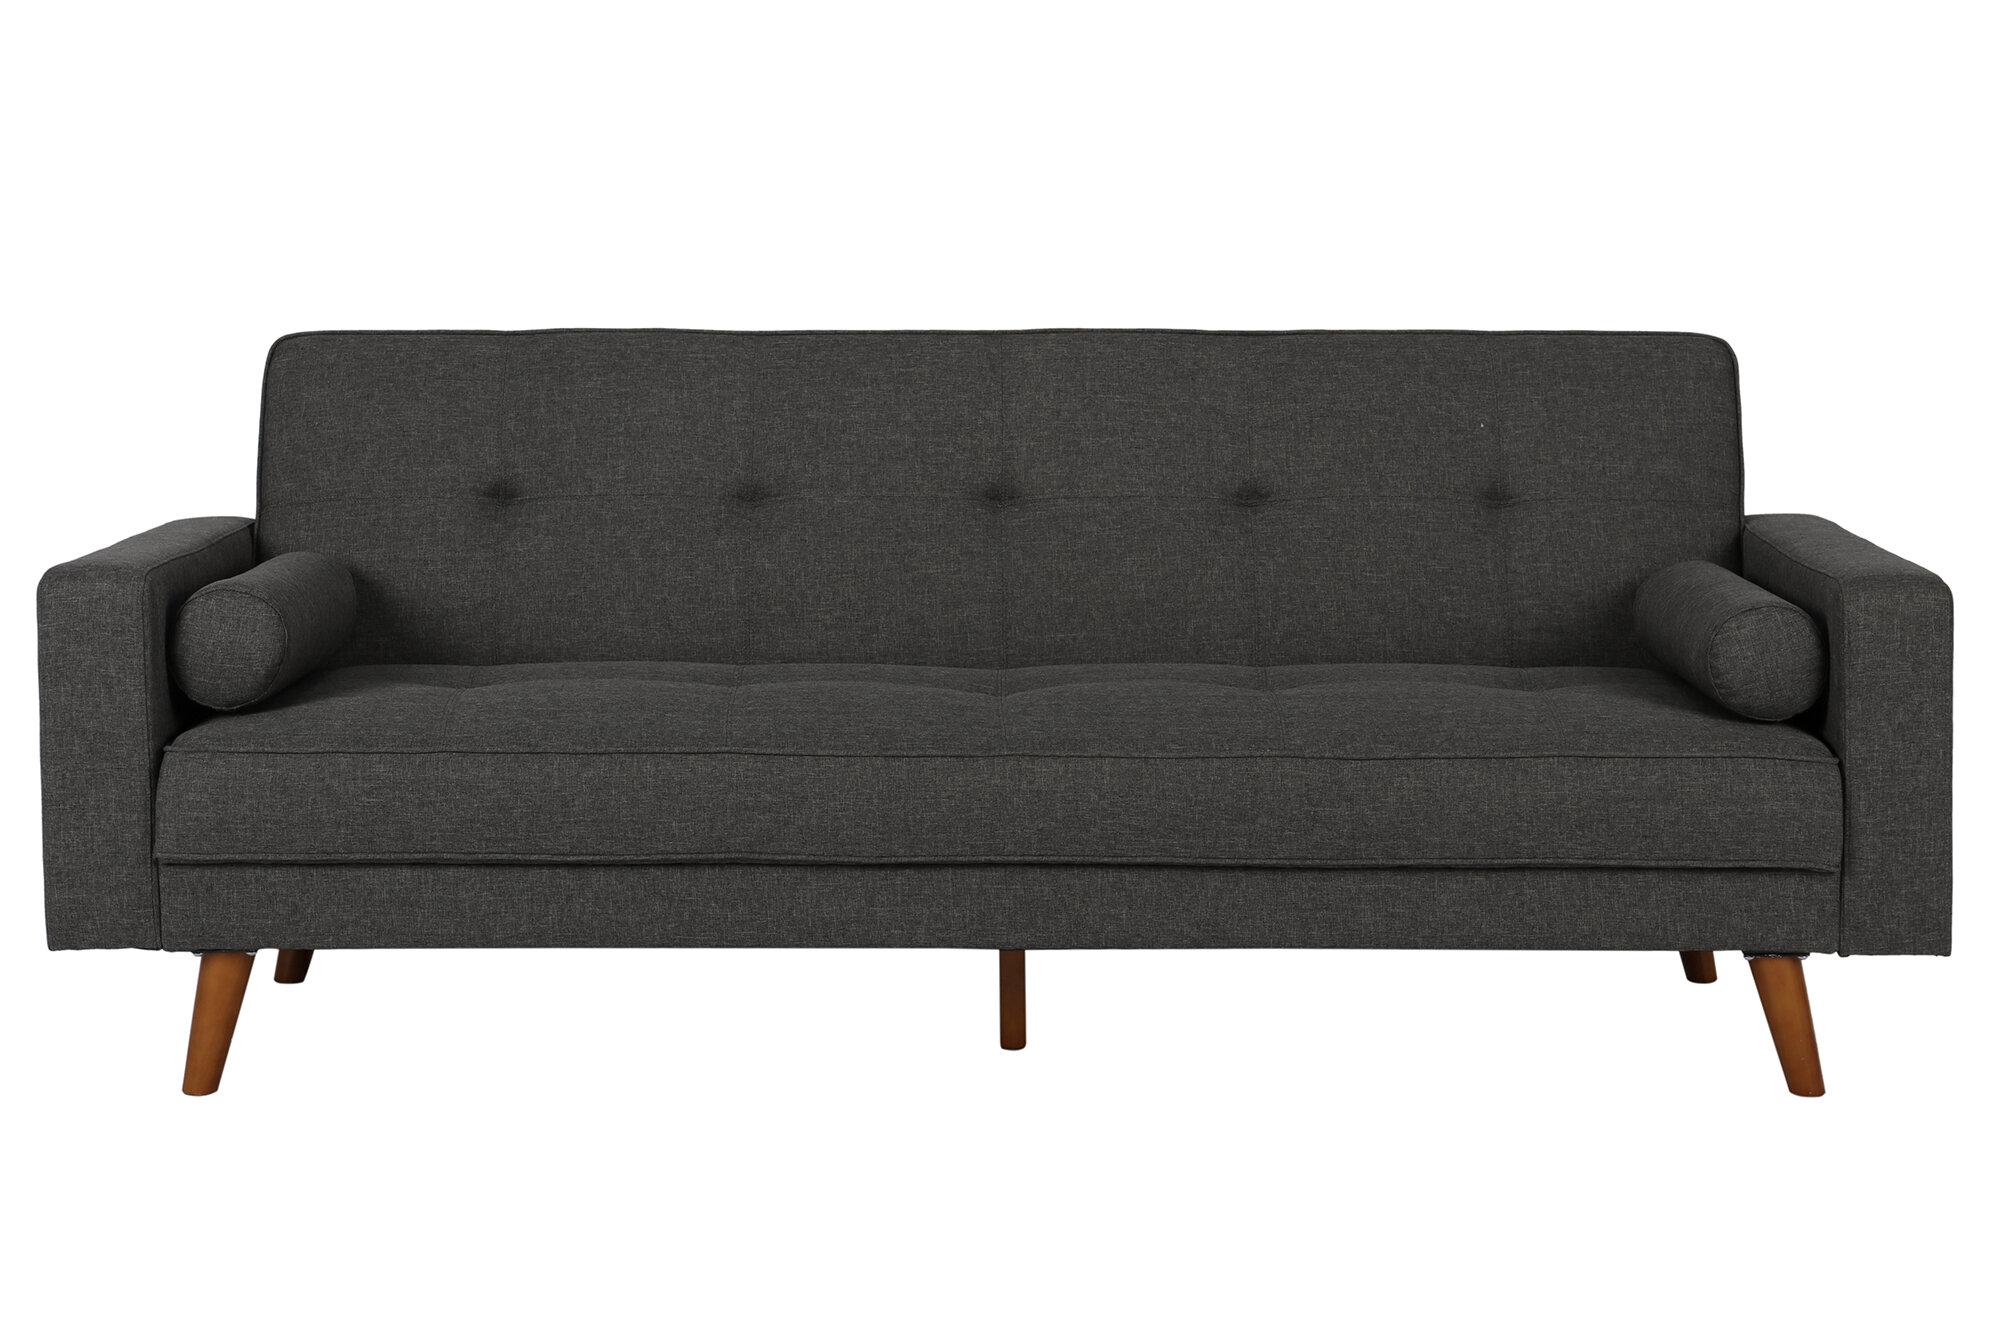 most comfortable sleeper sofa. Sleeper Sofa. Delighful Throughout Sofa B Most Comfortable A